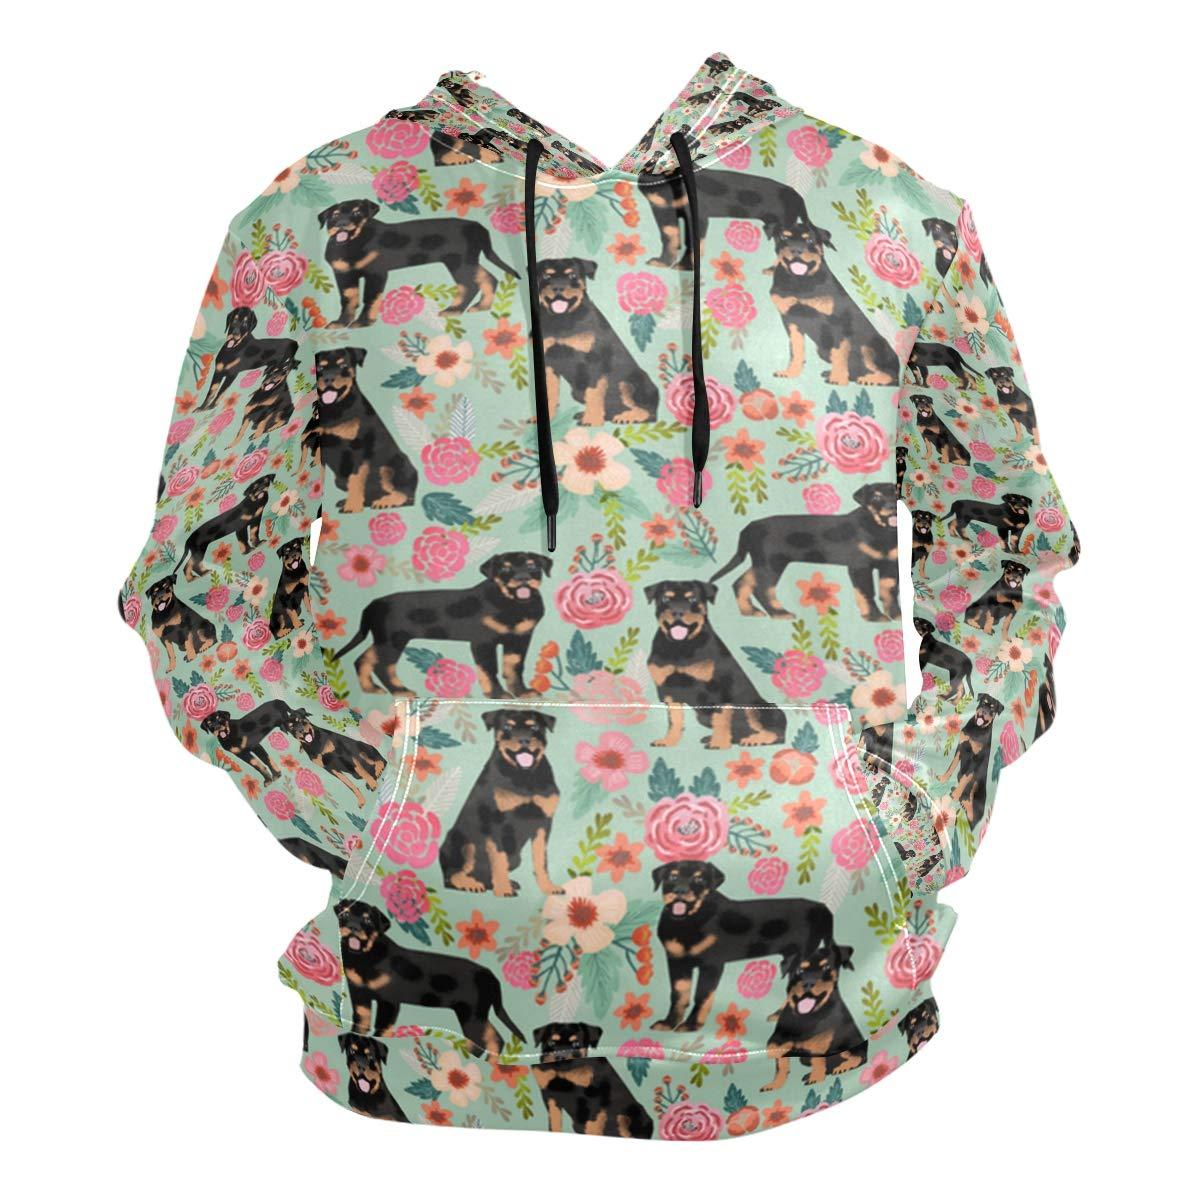 Medium Charlley Lee Men's Hooded Sweatshirt redtweiler Dog and Floral Funny Fashion Hoodie